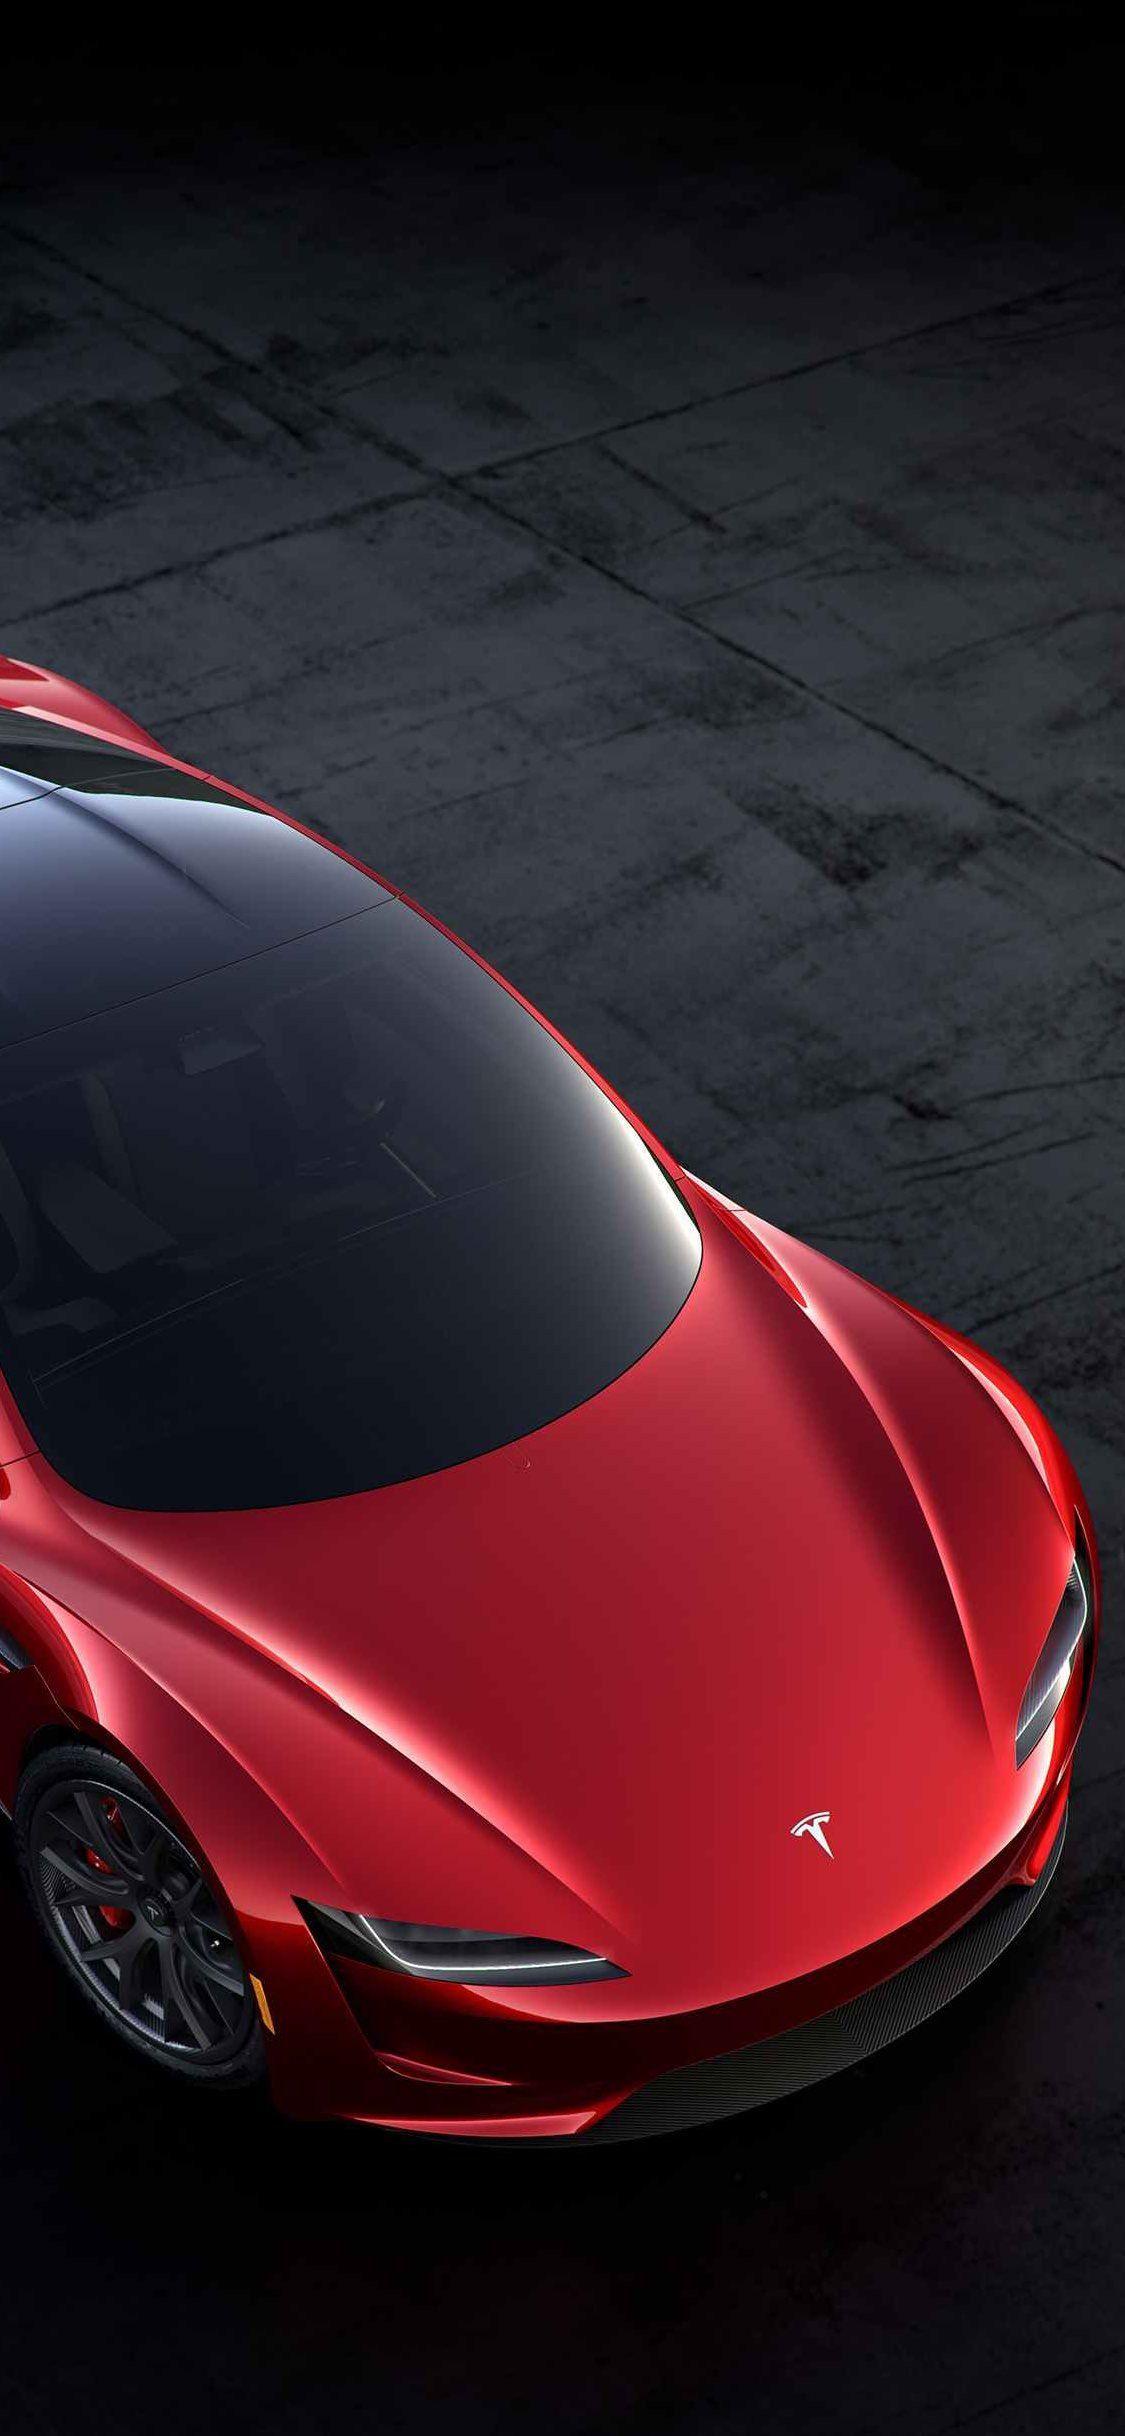 Tesla Iphone Wallpapers Top Free Tesla Iphone Backgrounds